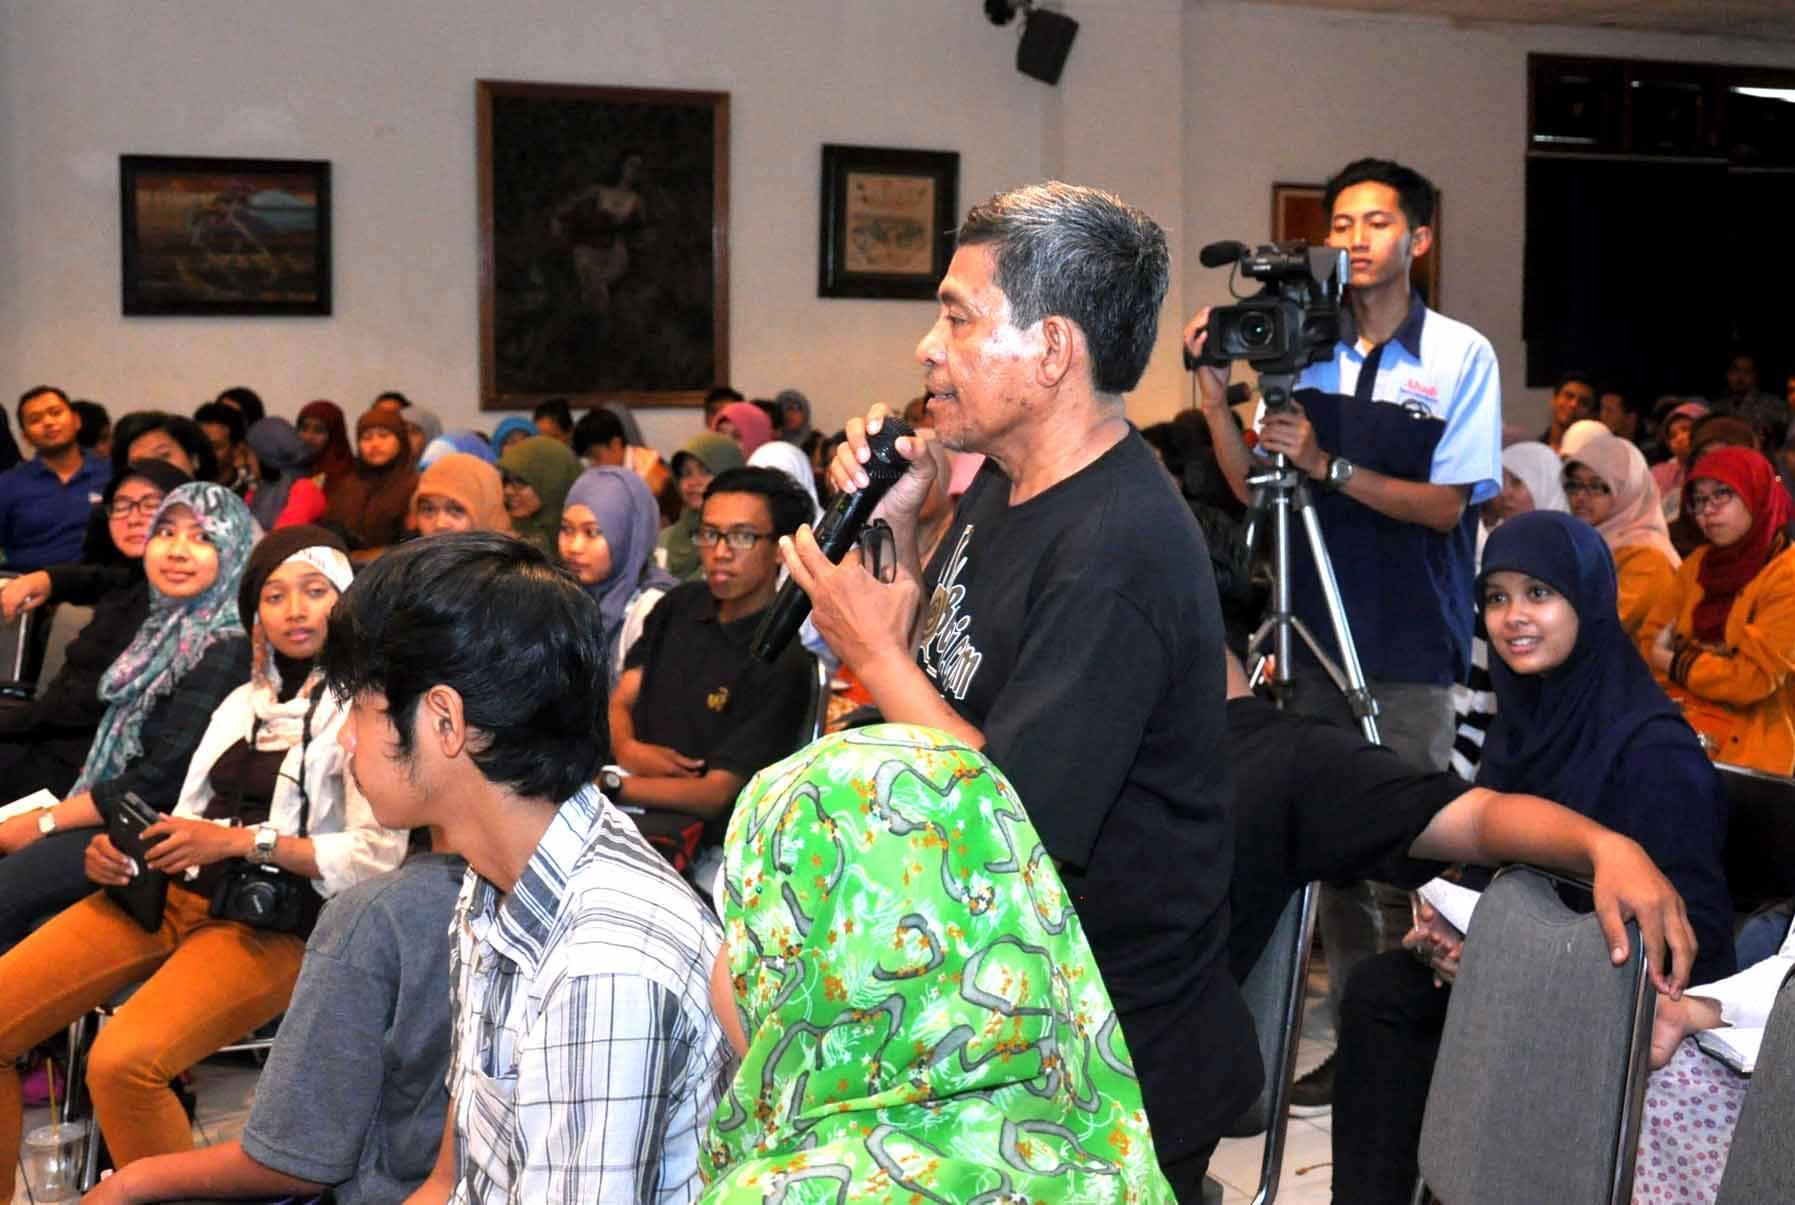 Ikut lomba ngetwit di Jogyakarta dalam sebuah acara launching buku (foto : dok pribadi)